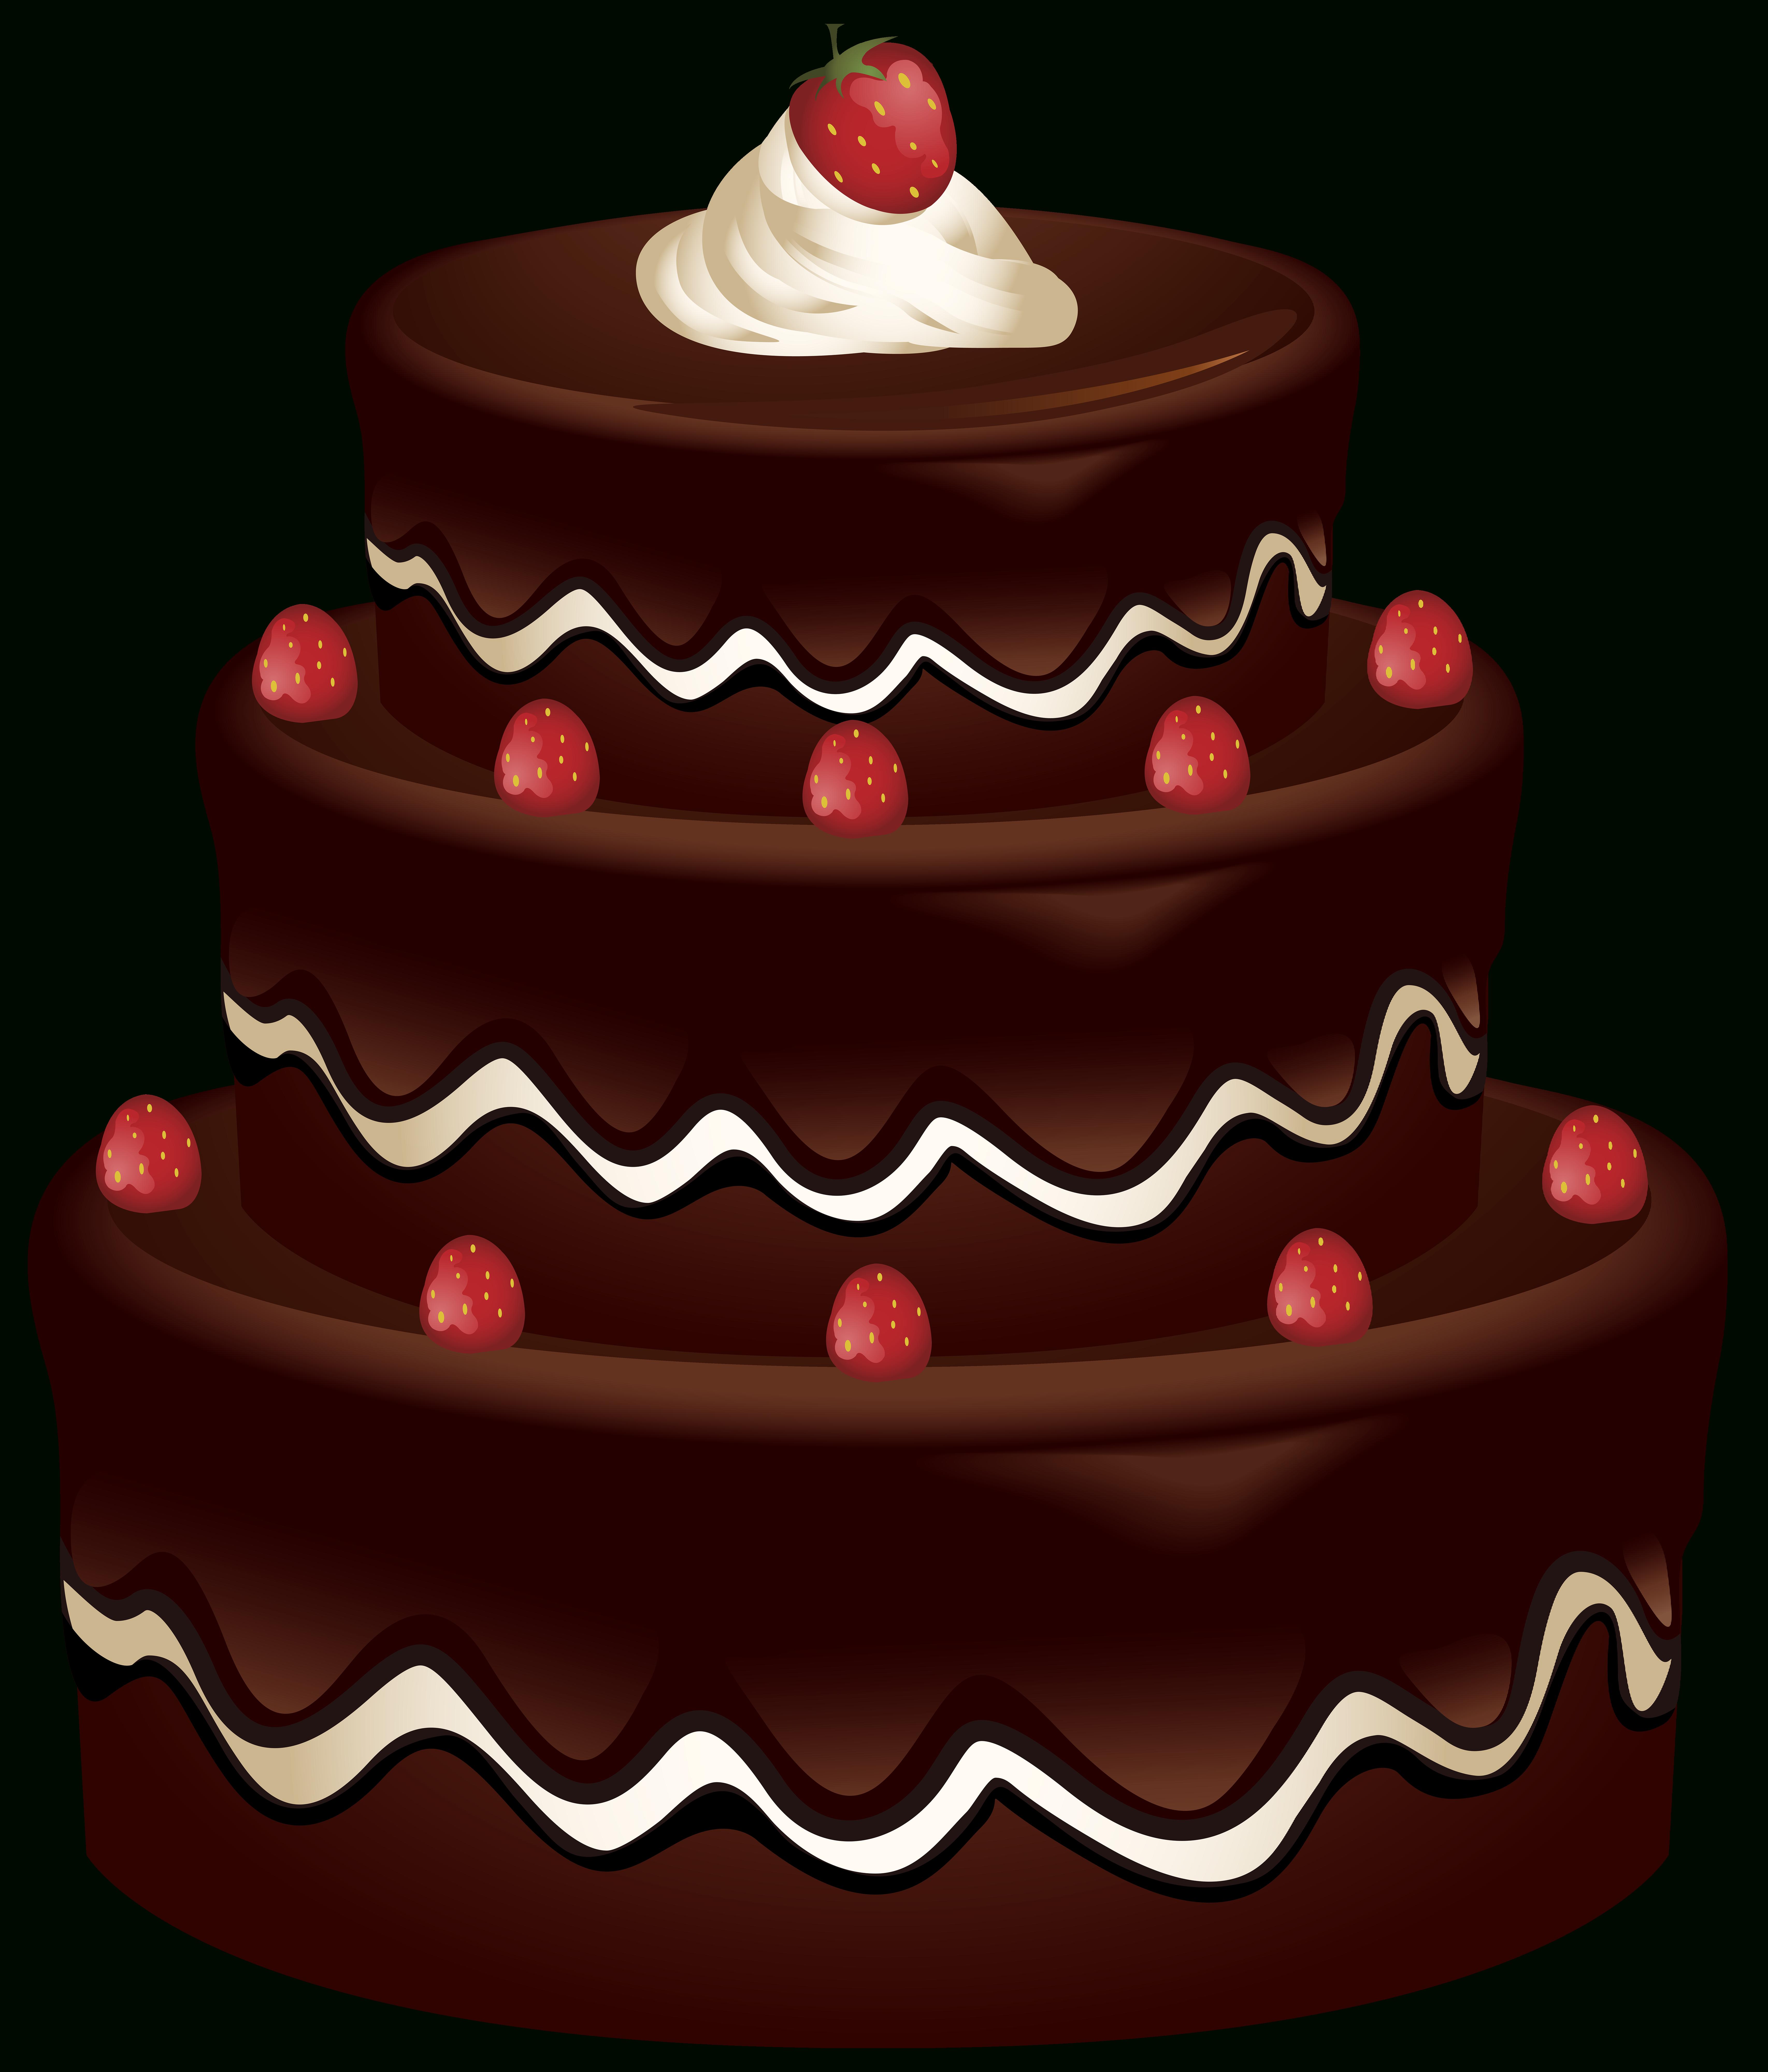 Free Beautiful Of Chocolate Birthday Cake Clipart Cake Illustration Cake Clipart Birthday Cake Chocolate